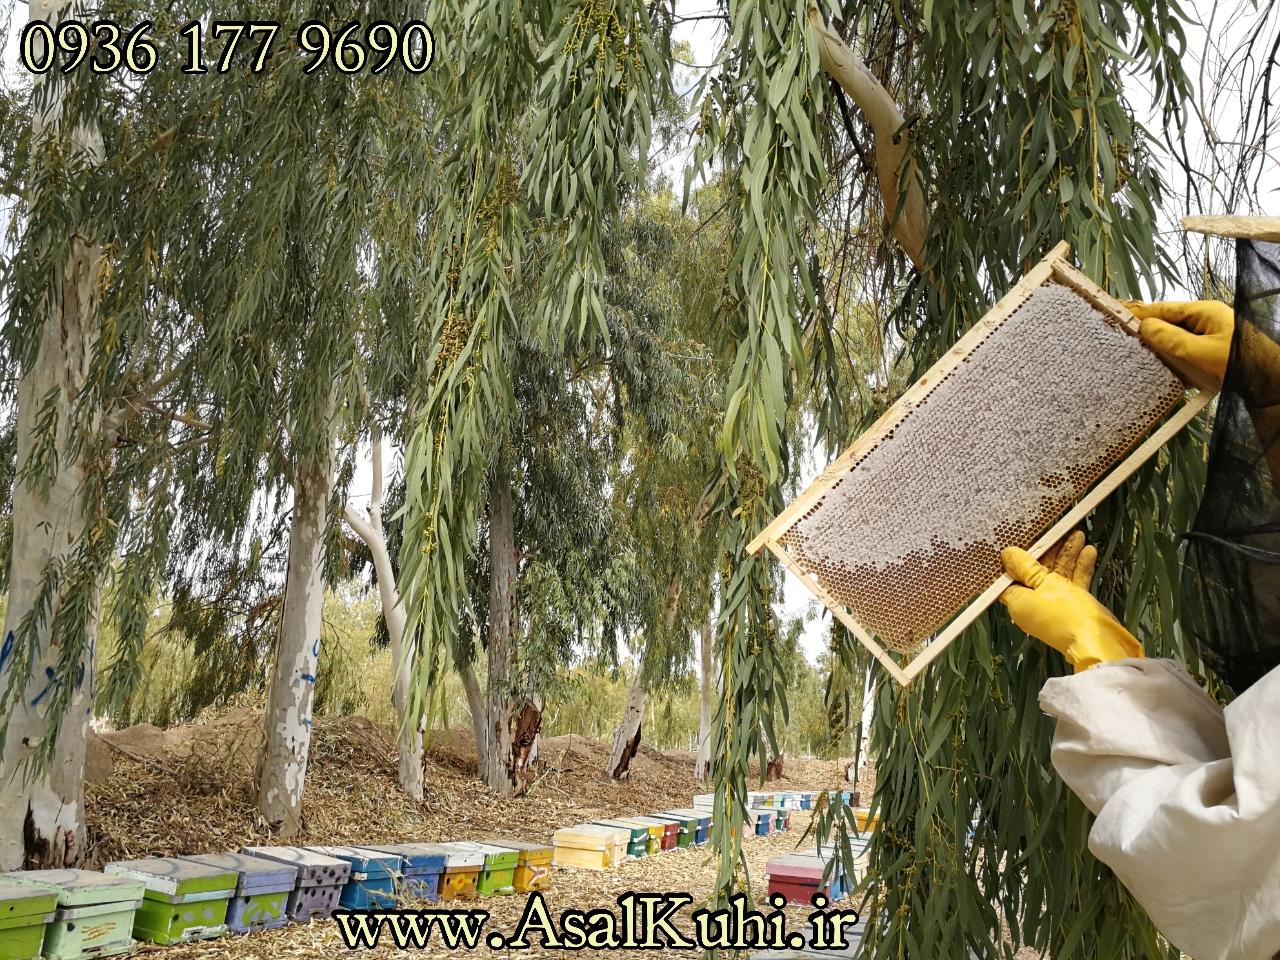 خواص درمانی عسل اکالیپتوس